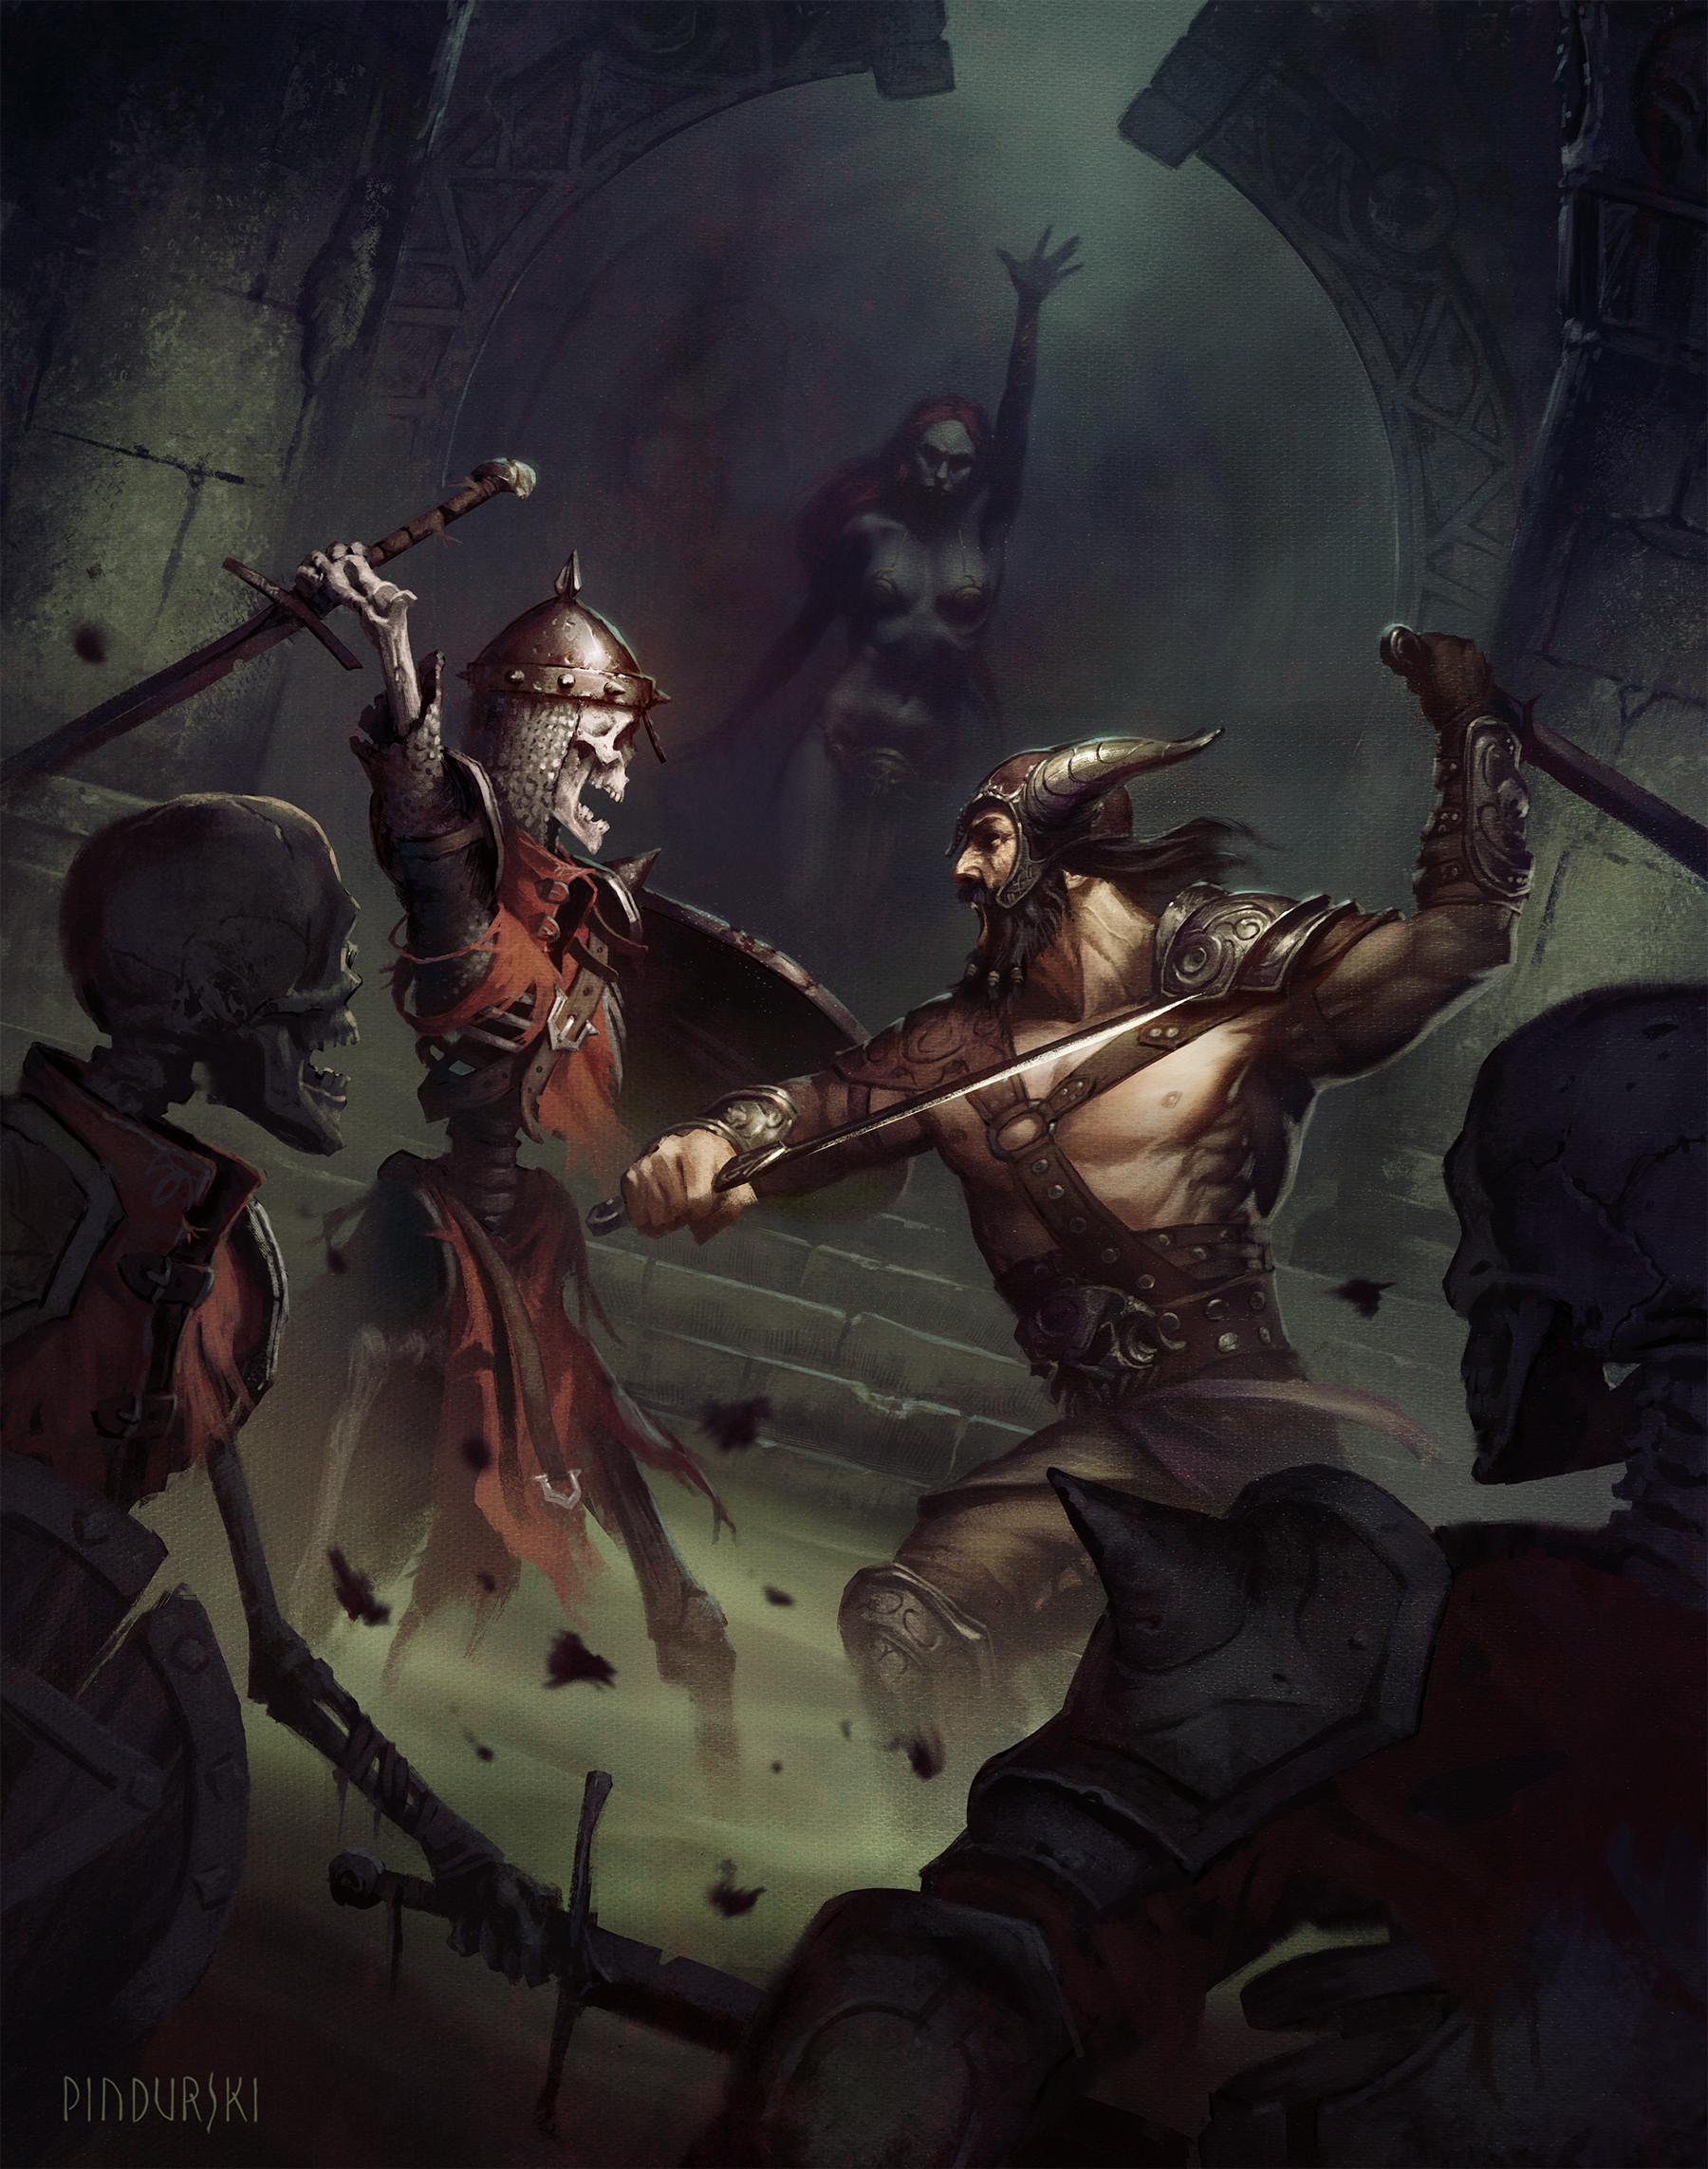 Hugh pindur pindurski a little dungeon scuffle